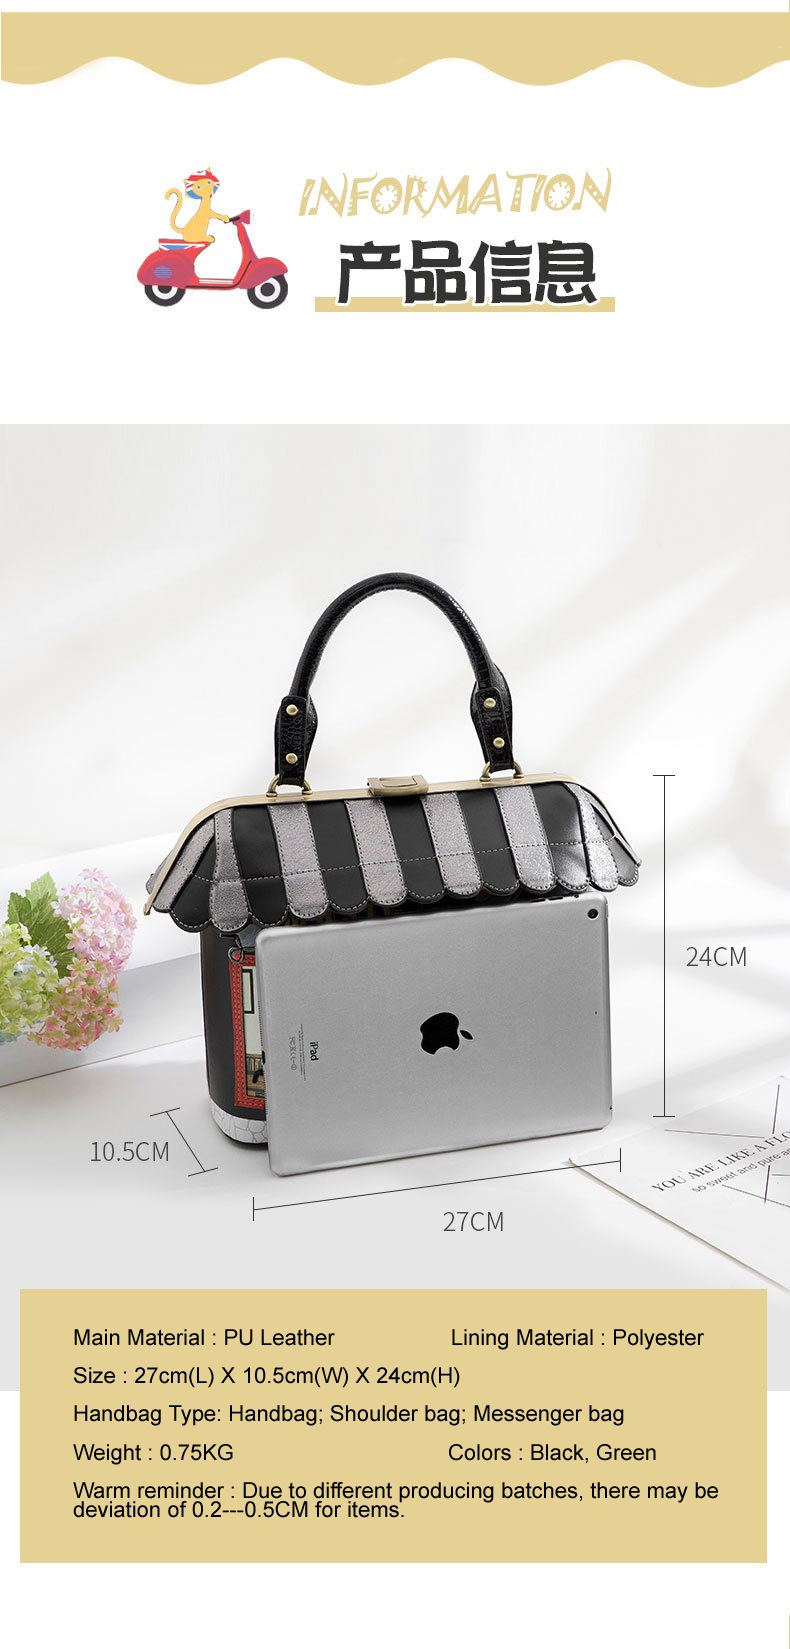 Braccialini Handbag Style